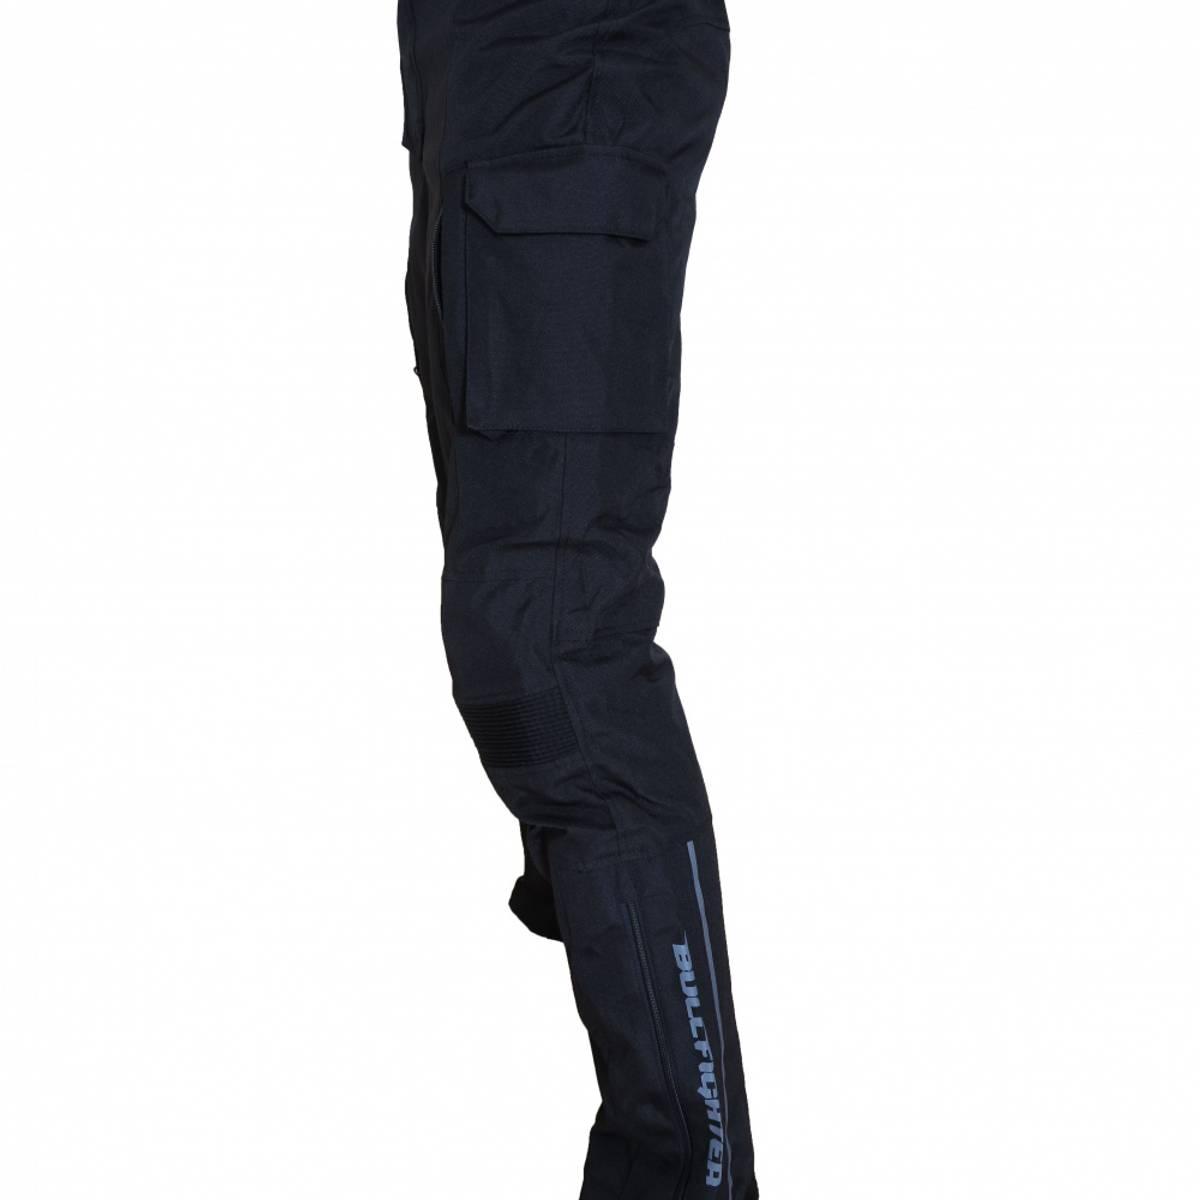 Bullfighter Vulcan Evo bukse Regular, black